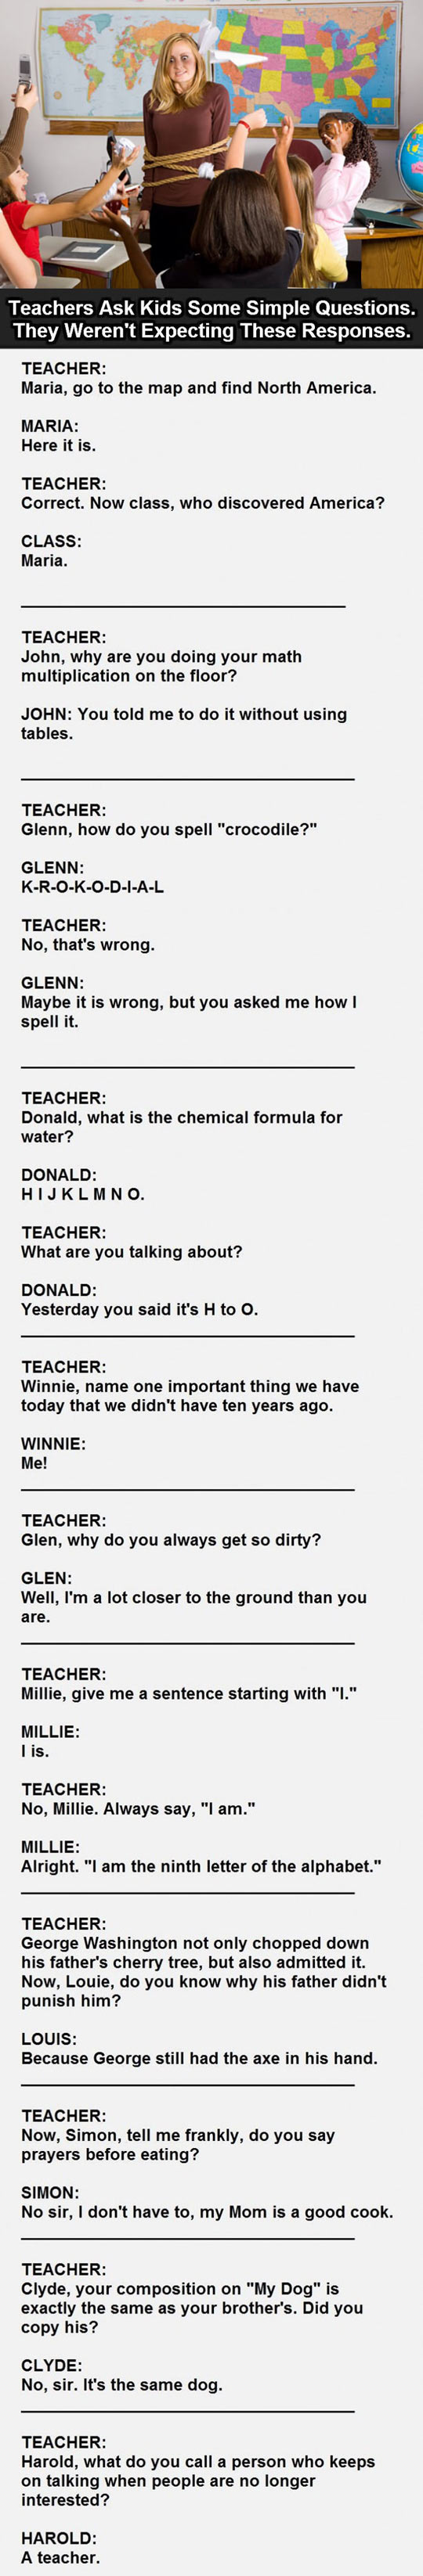 cool-teacher-students-kids-questions